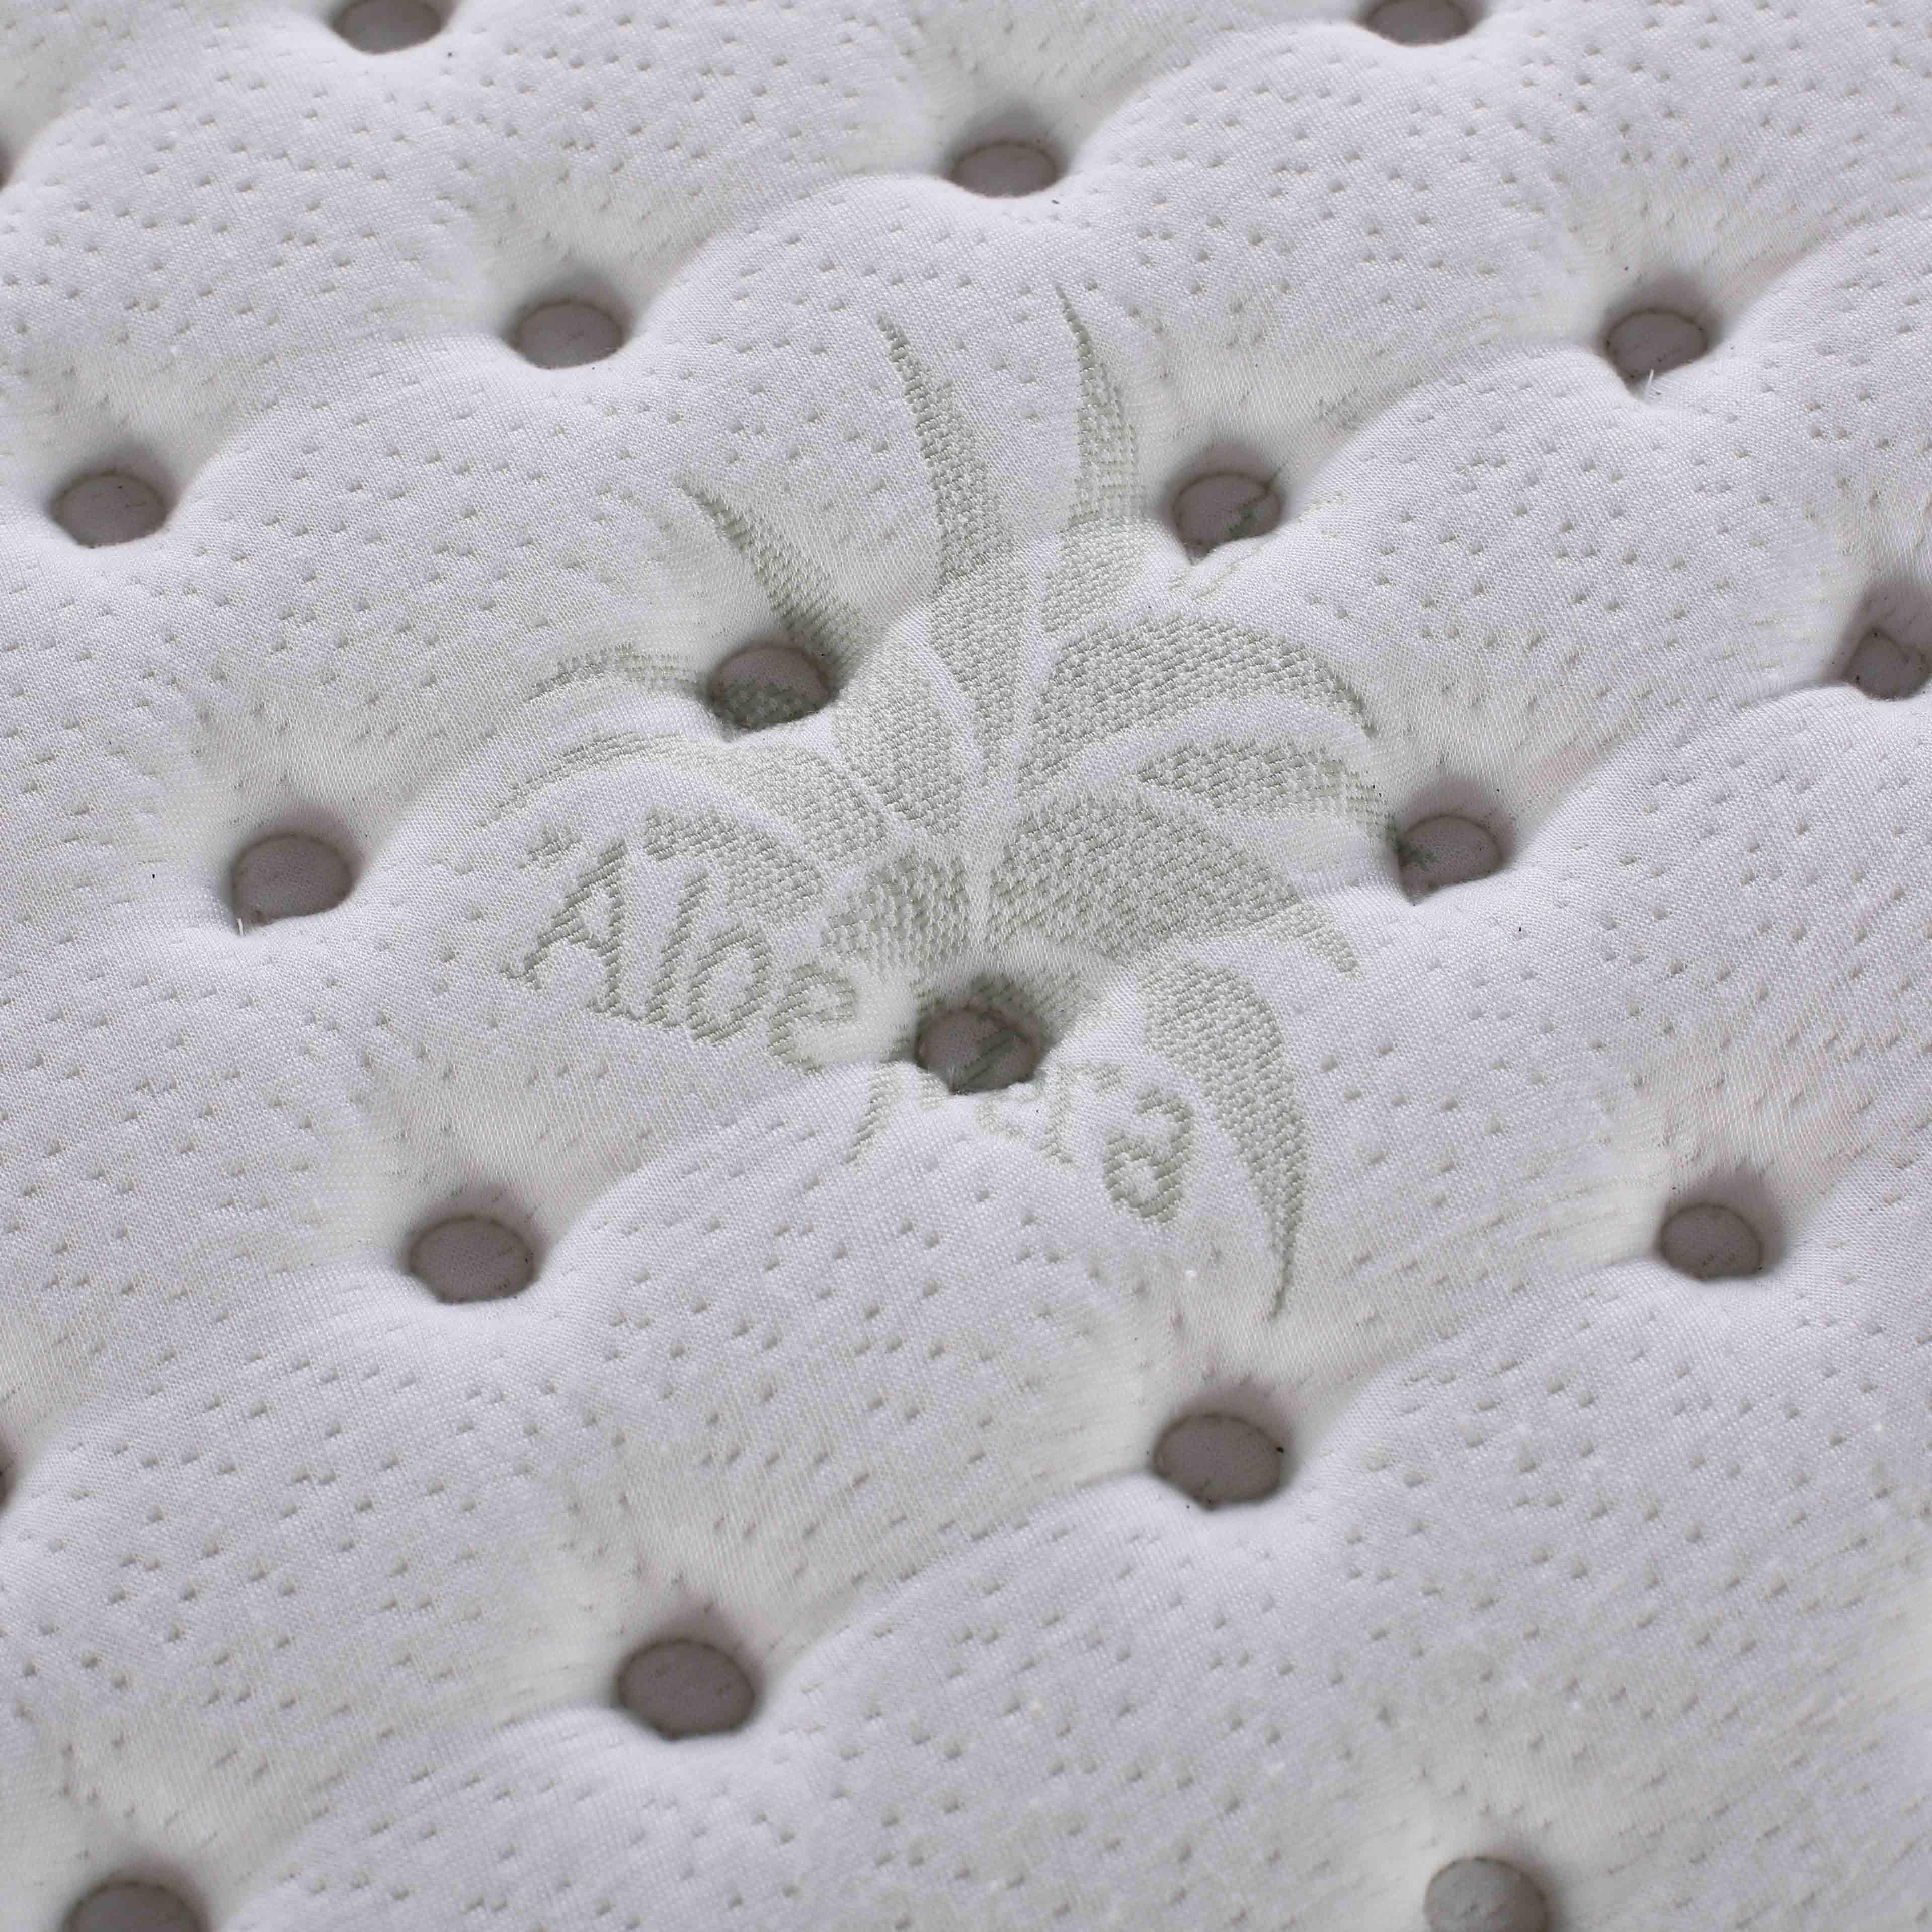 Custom Factory Supply King Queen Full Size Memory Foam Pocket Spring Hotel Bed Mattress in a Box - Jozy Mattress   Jozy.net